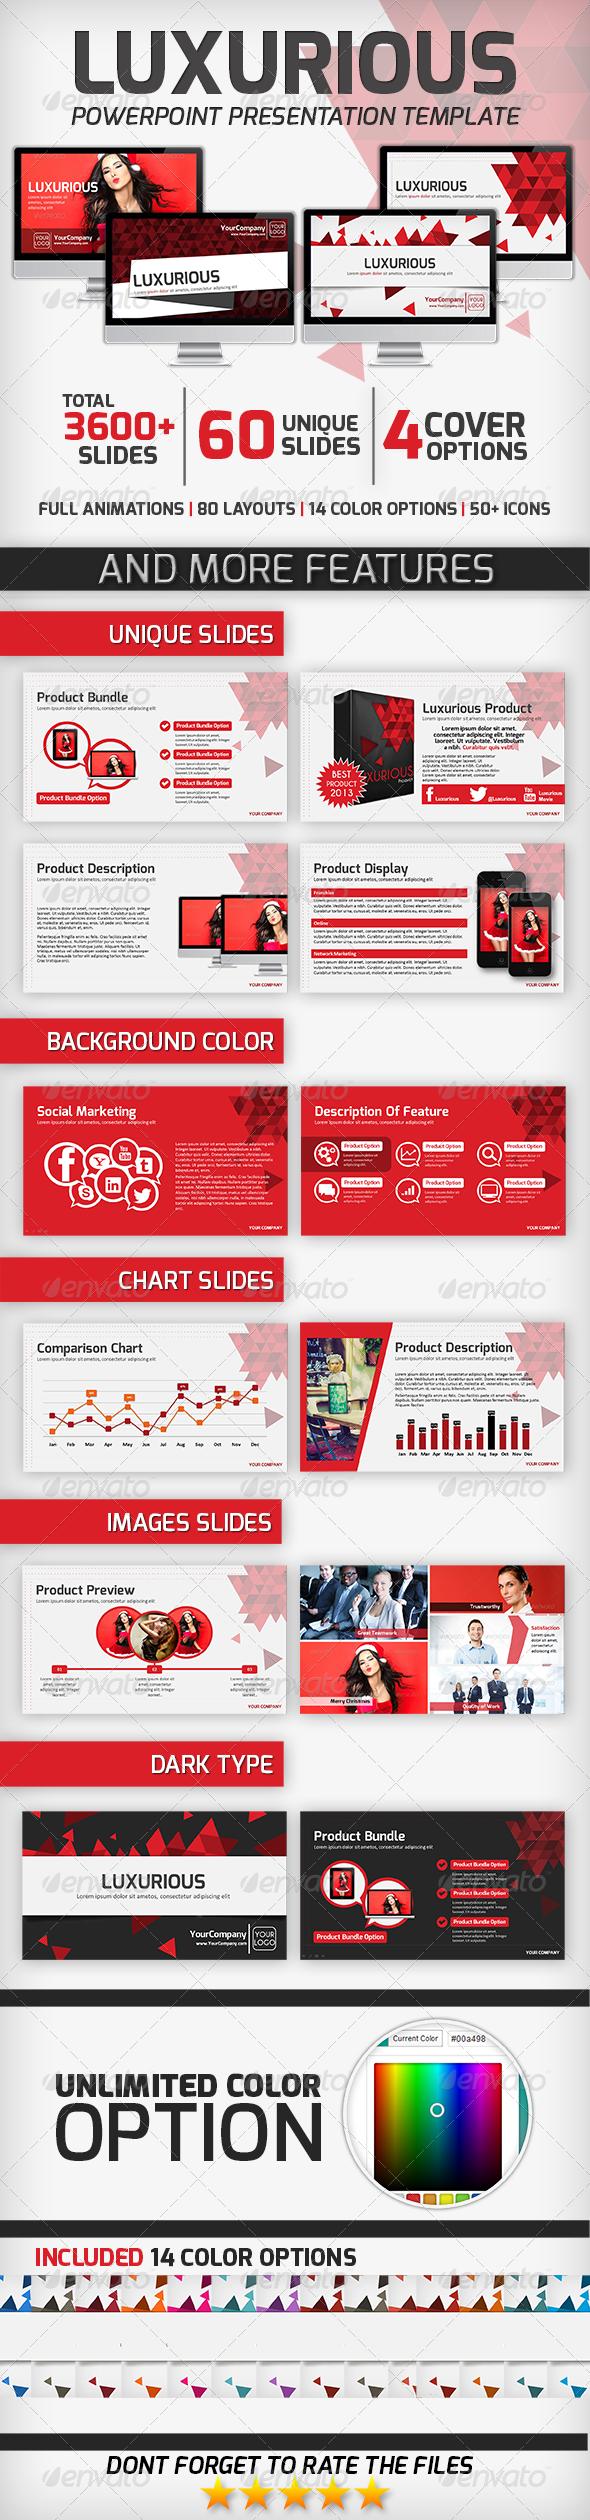 Luxurious PowerPoint Presentation Template - Business PowerPoint Templates